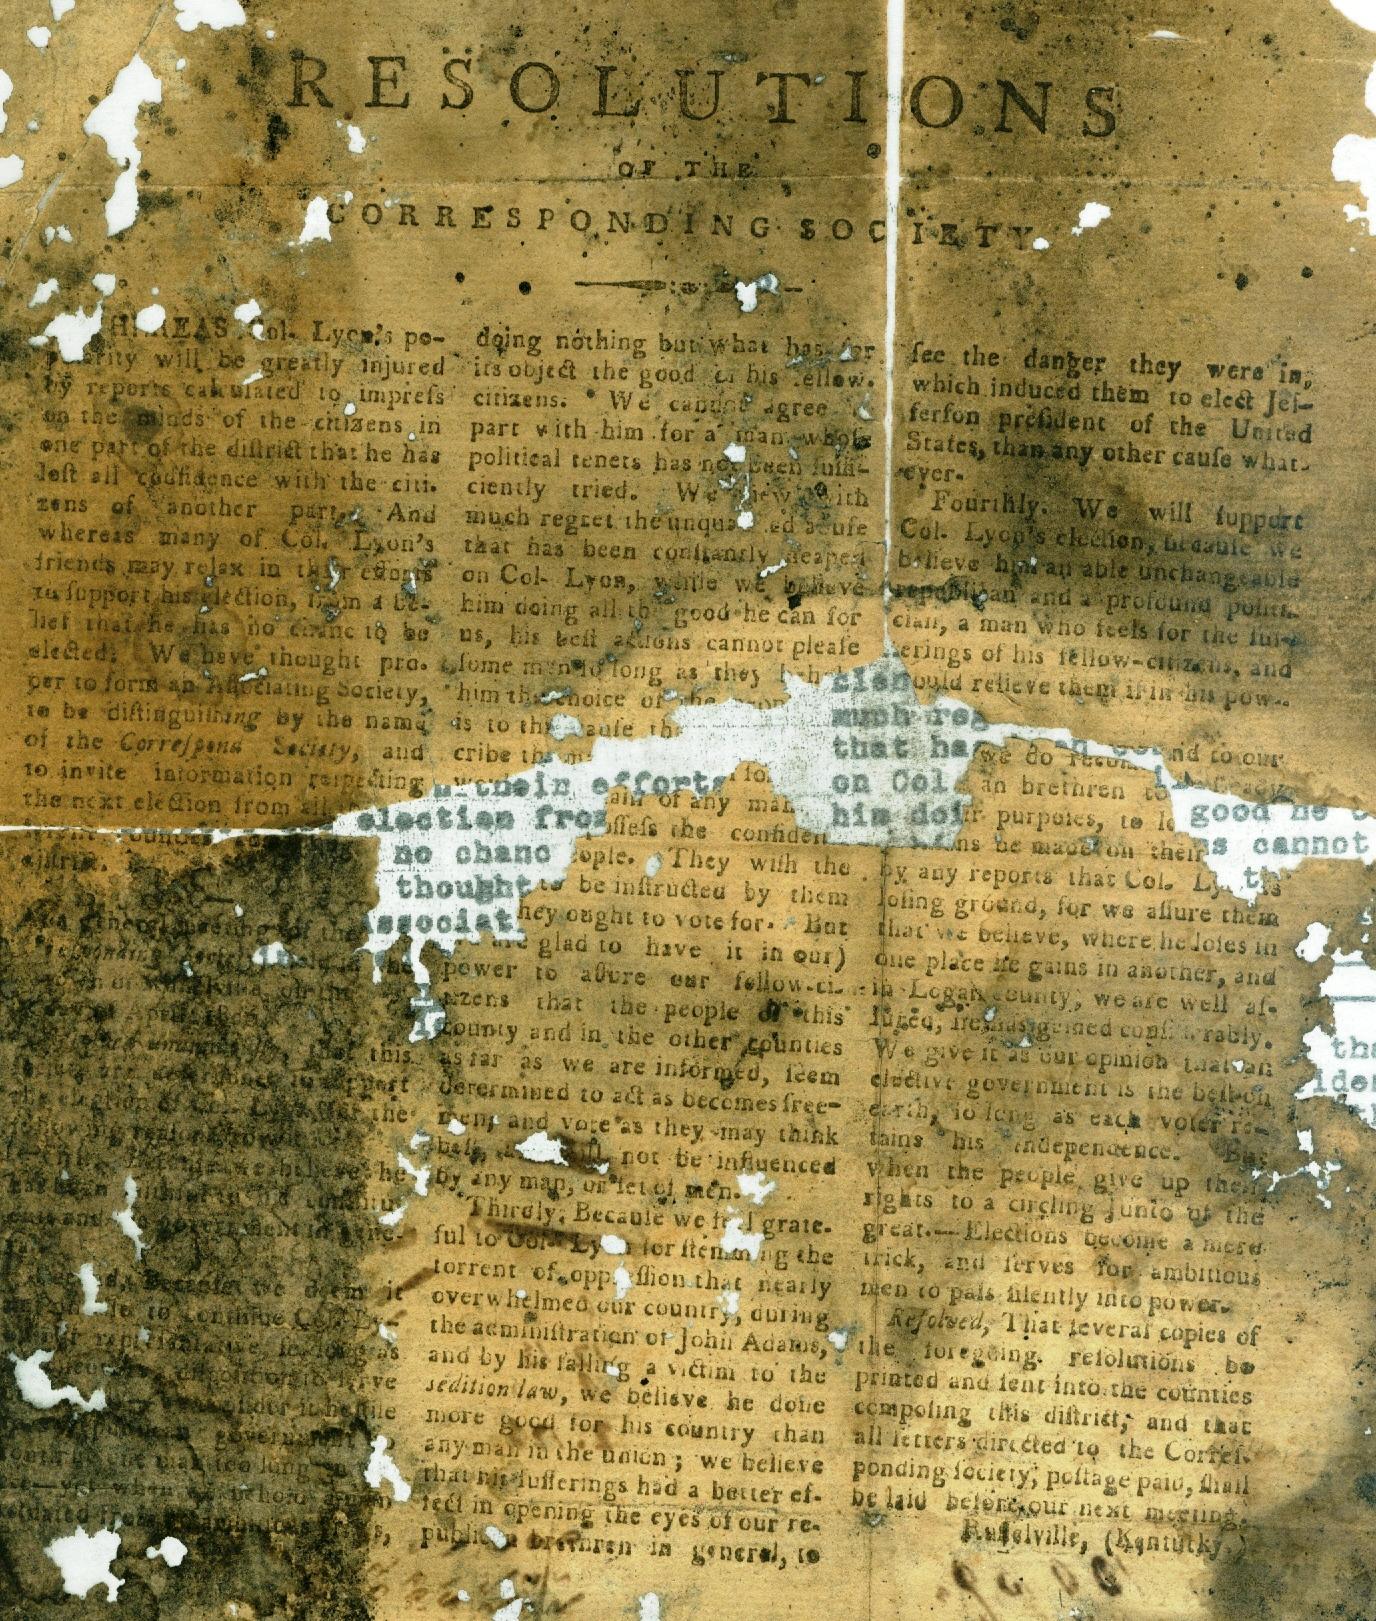 Matthew Lyon: The Sedition Act's First Victim